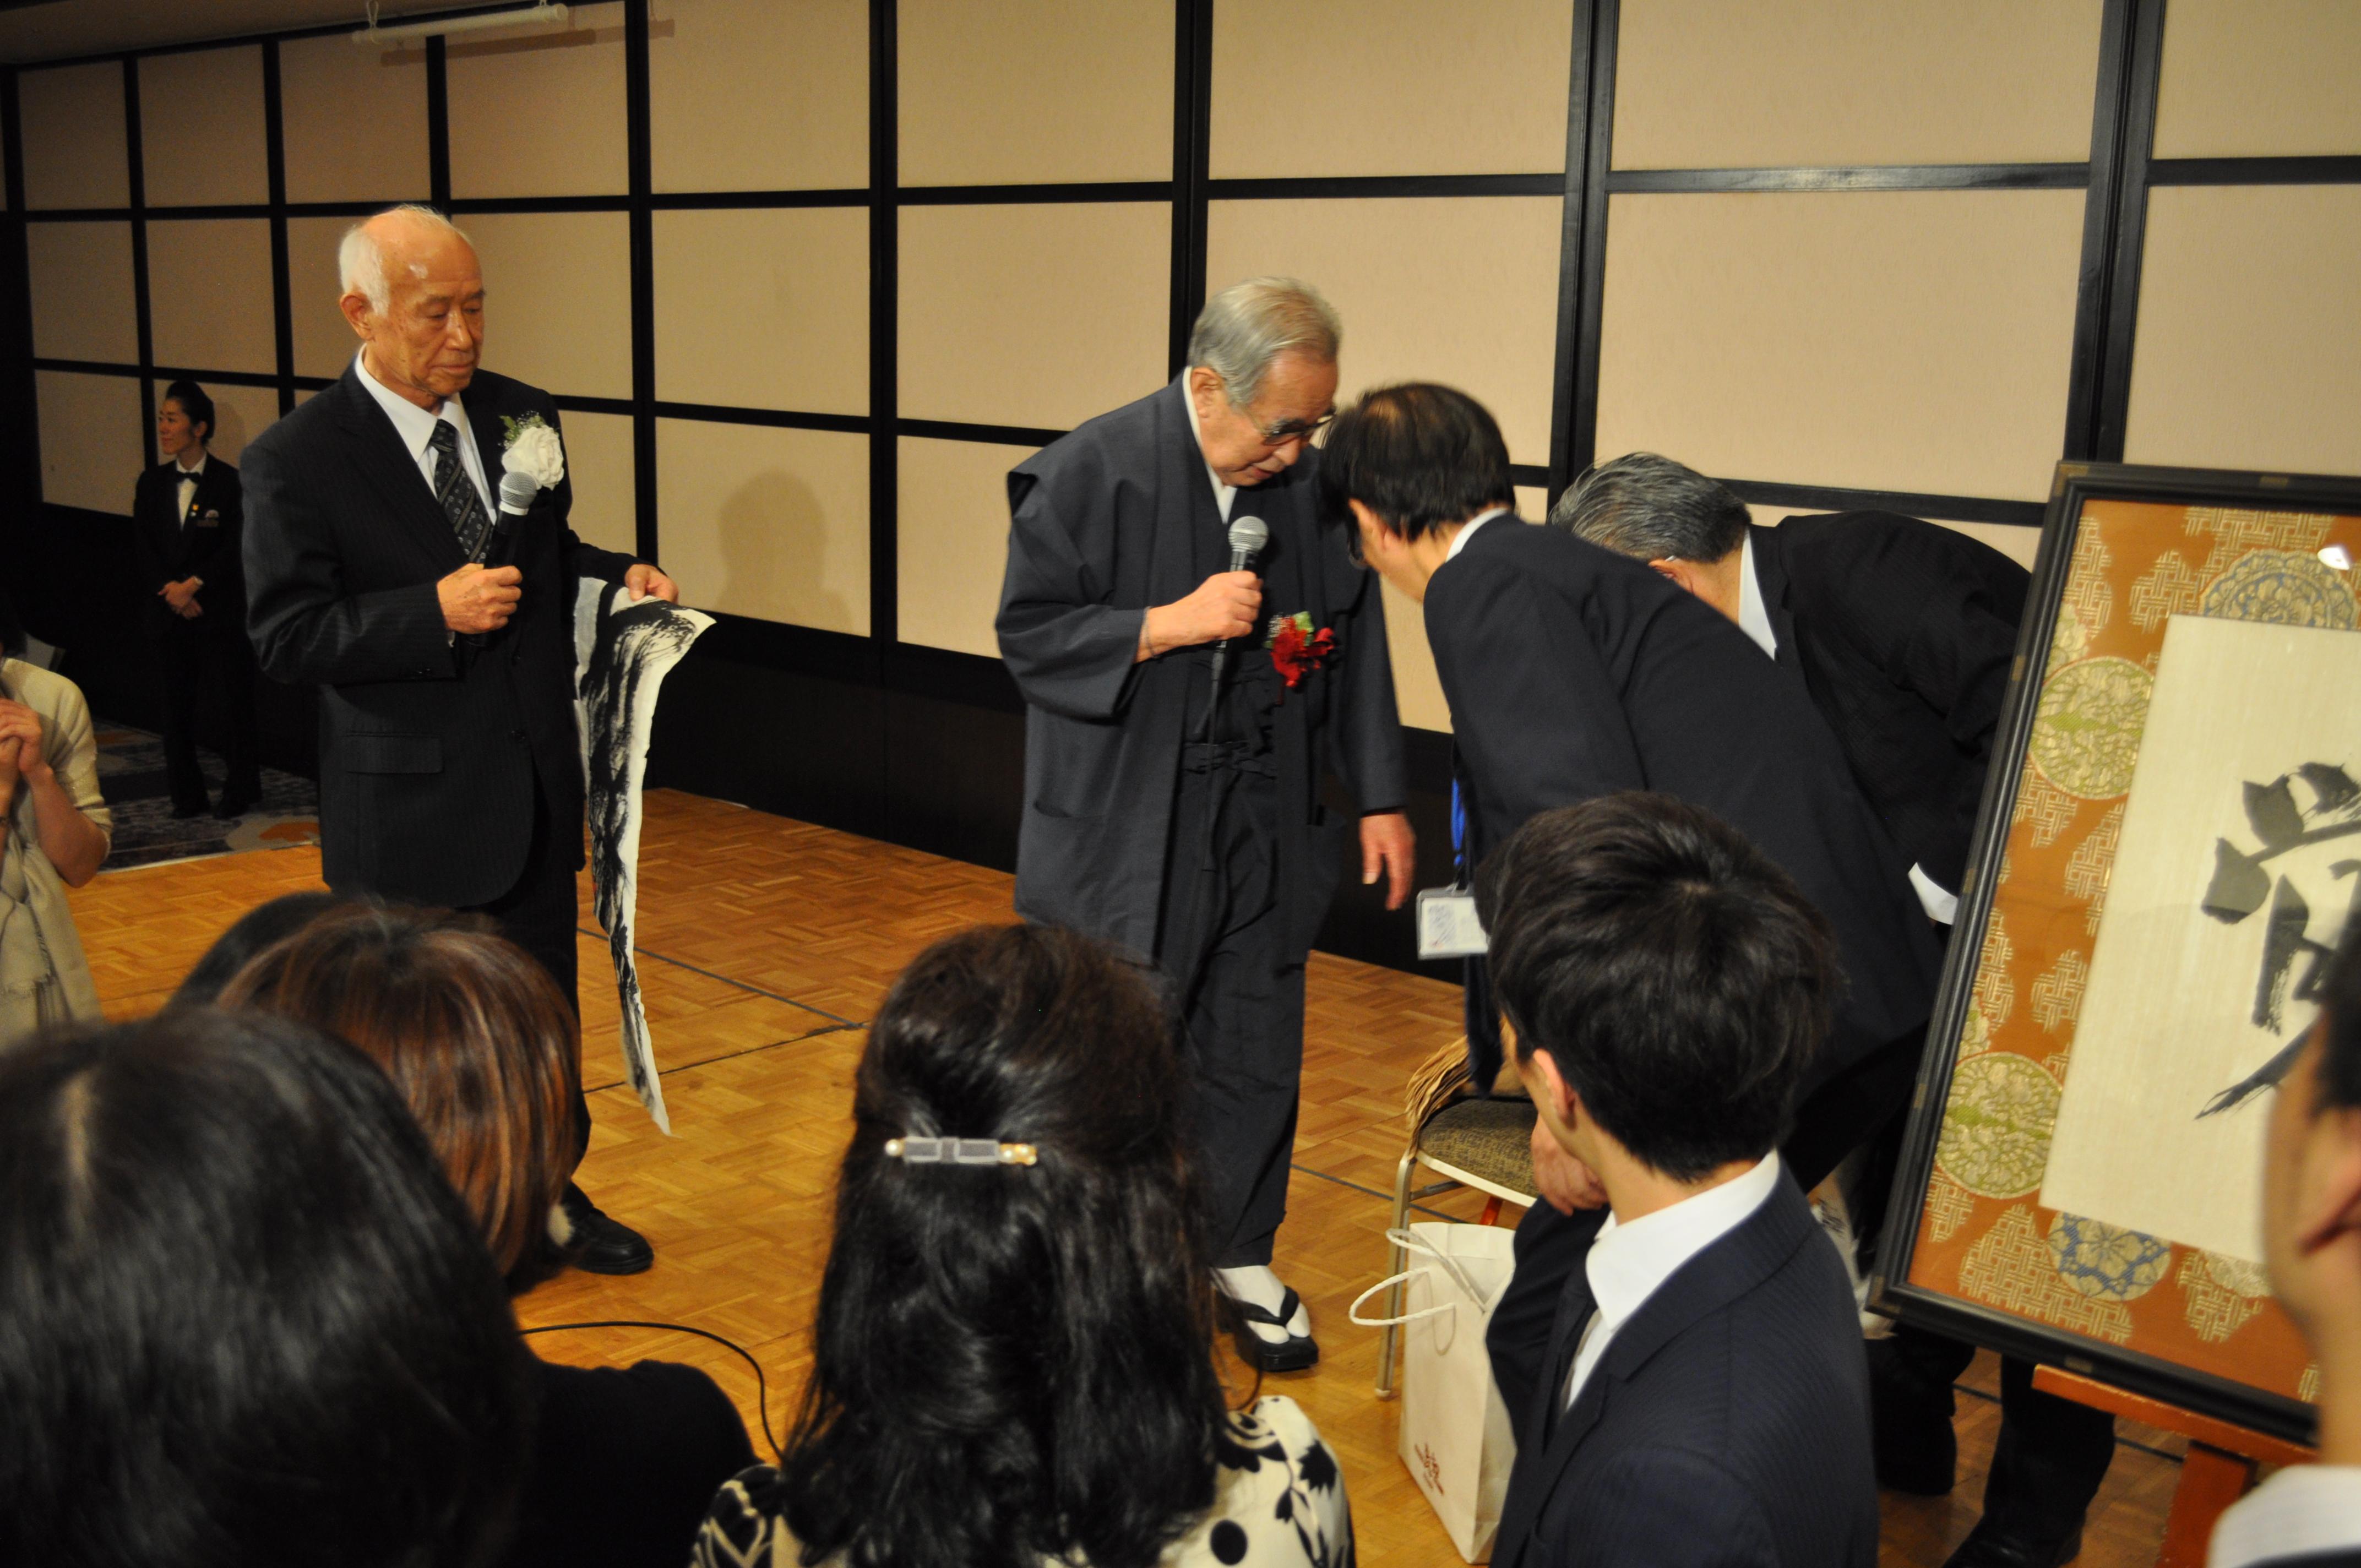 DSC 0589 - 第6回思風会全国大会2018in東京開催